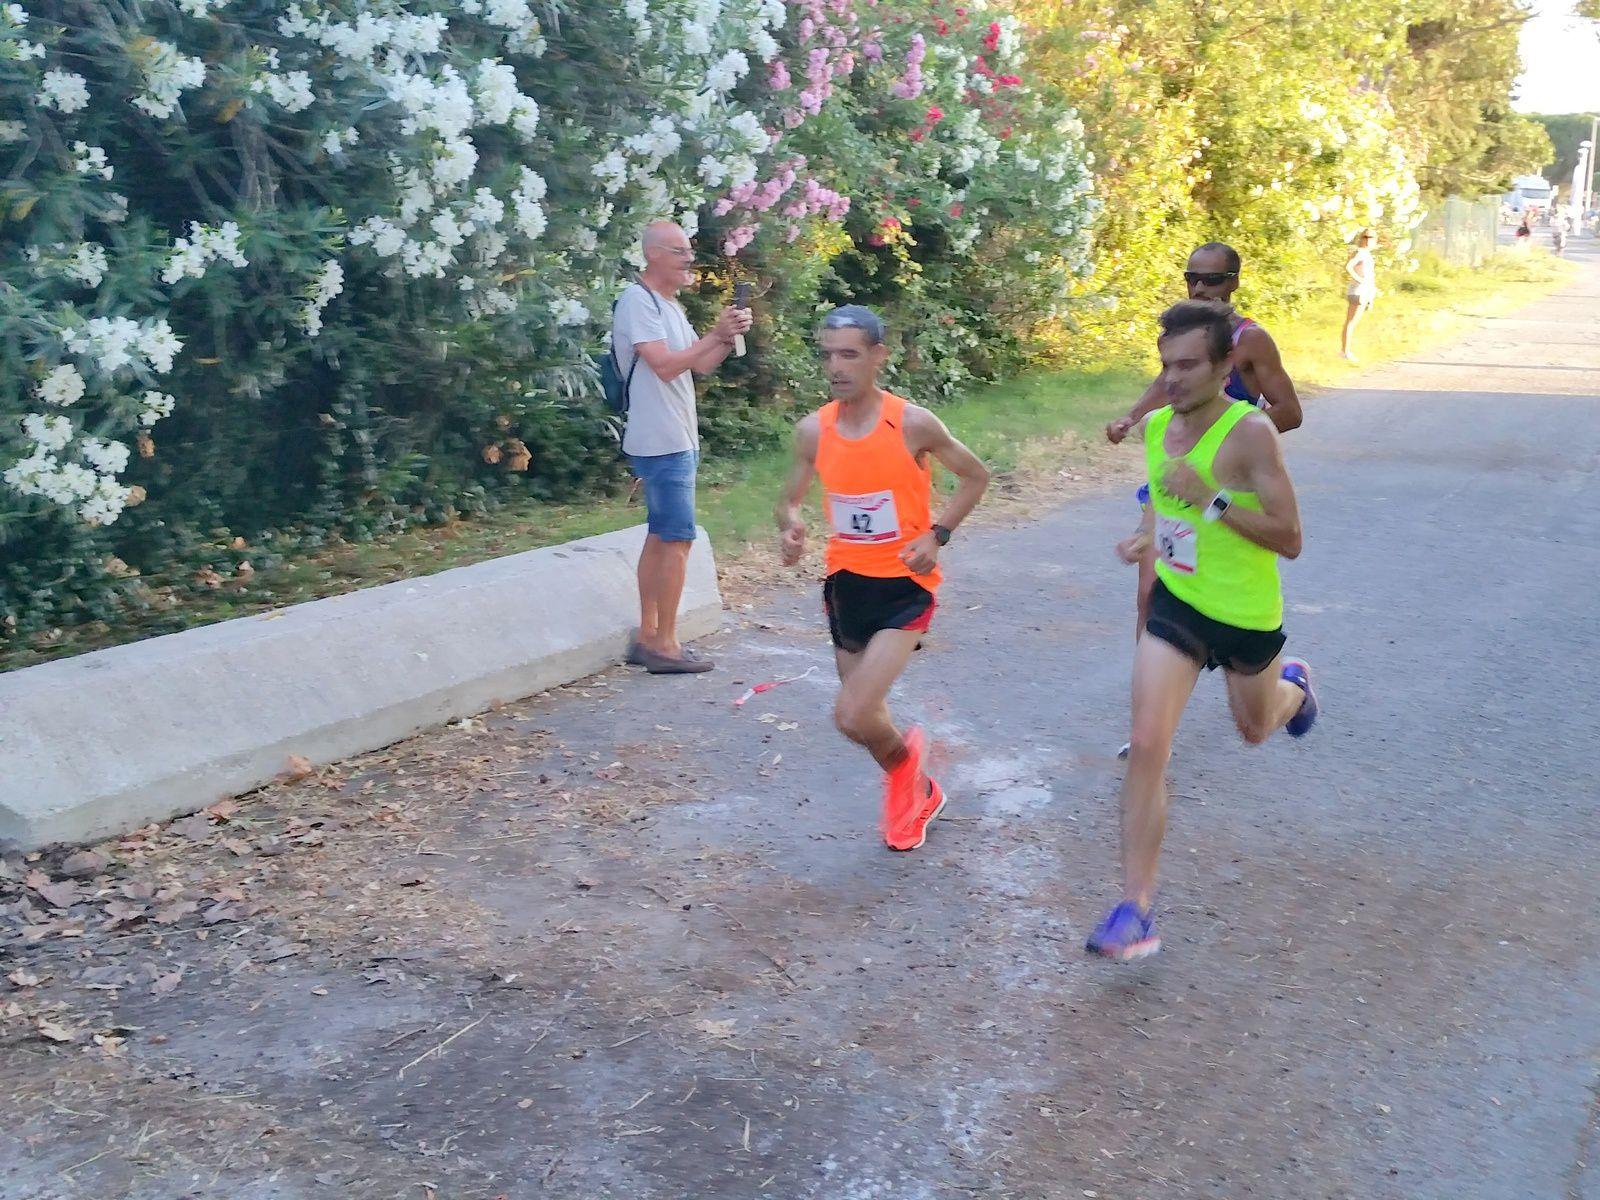 20-06-2015 FREJUS 10 kilomètres